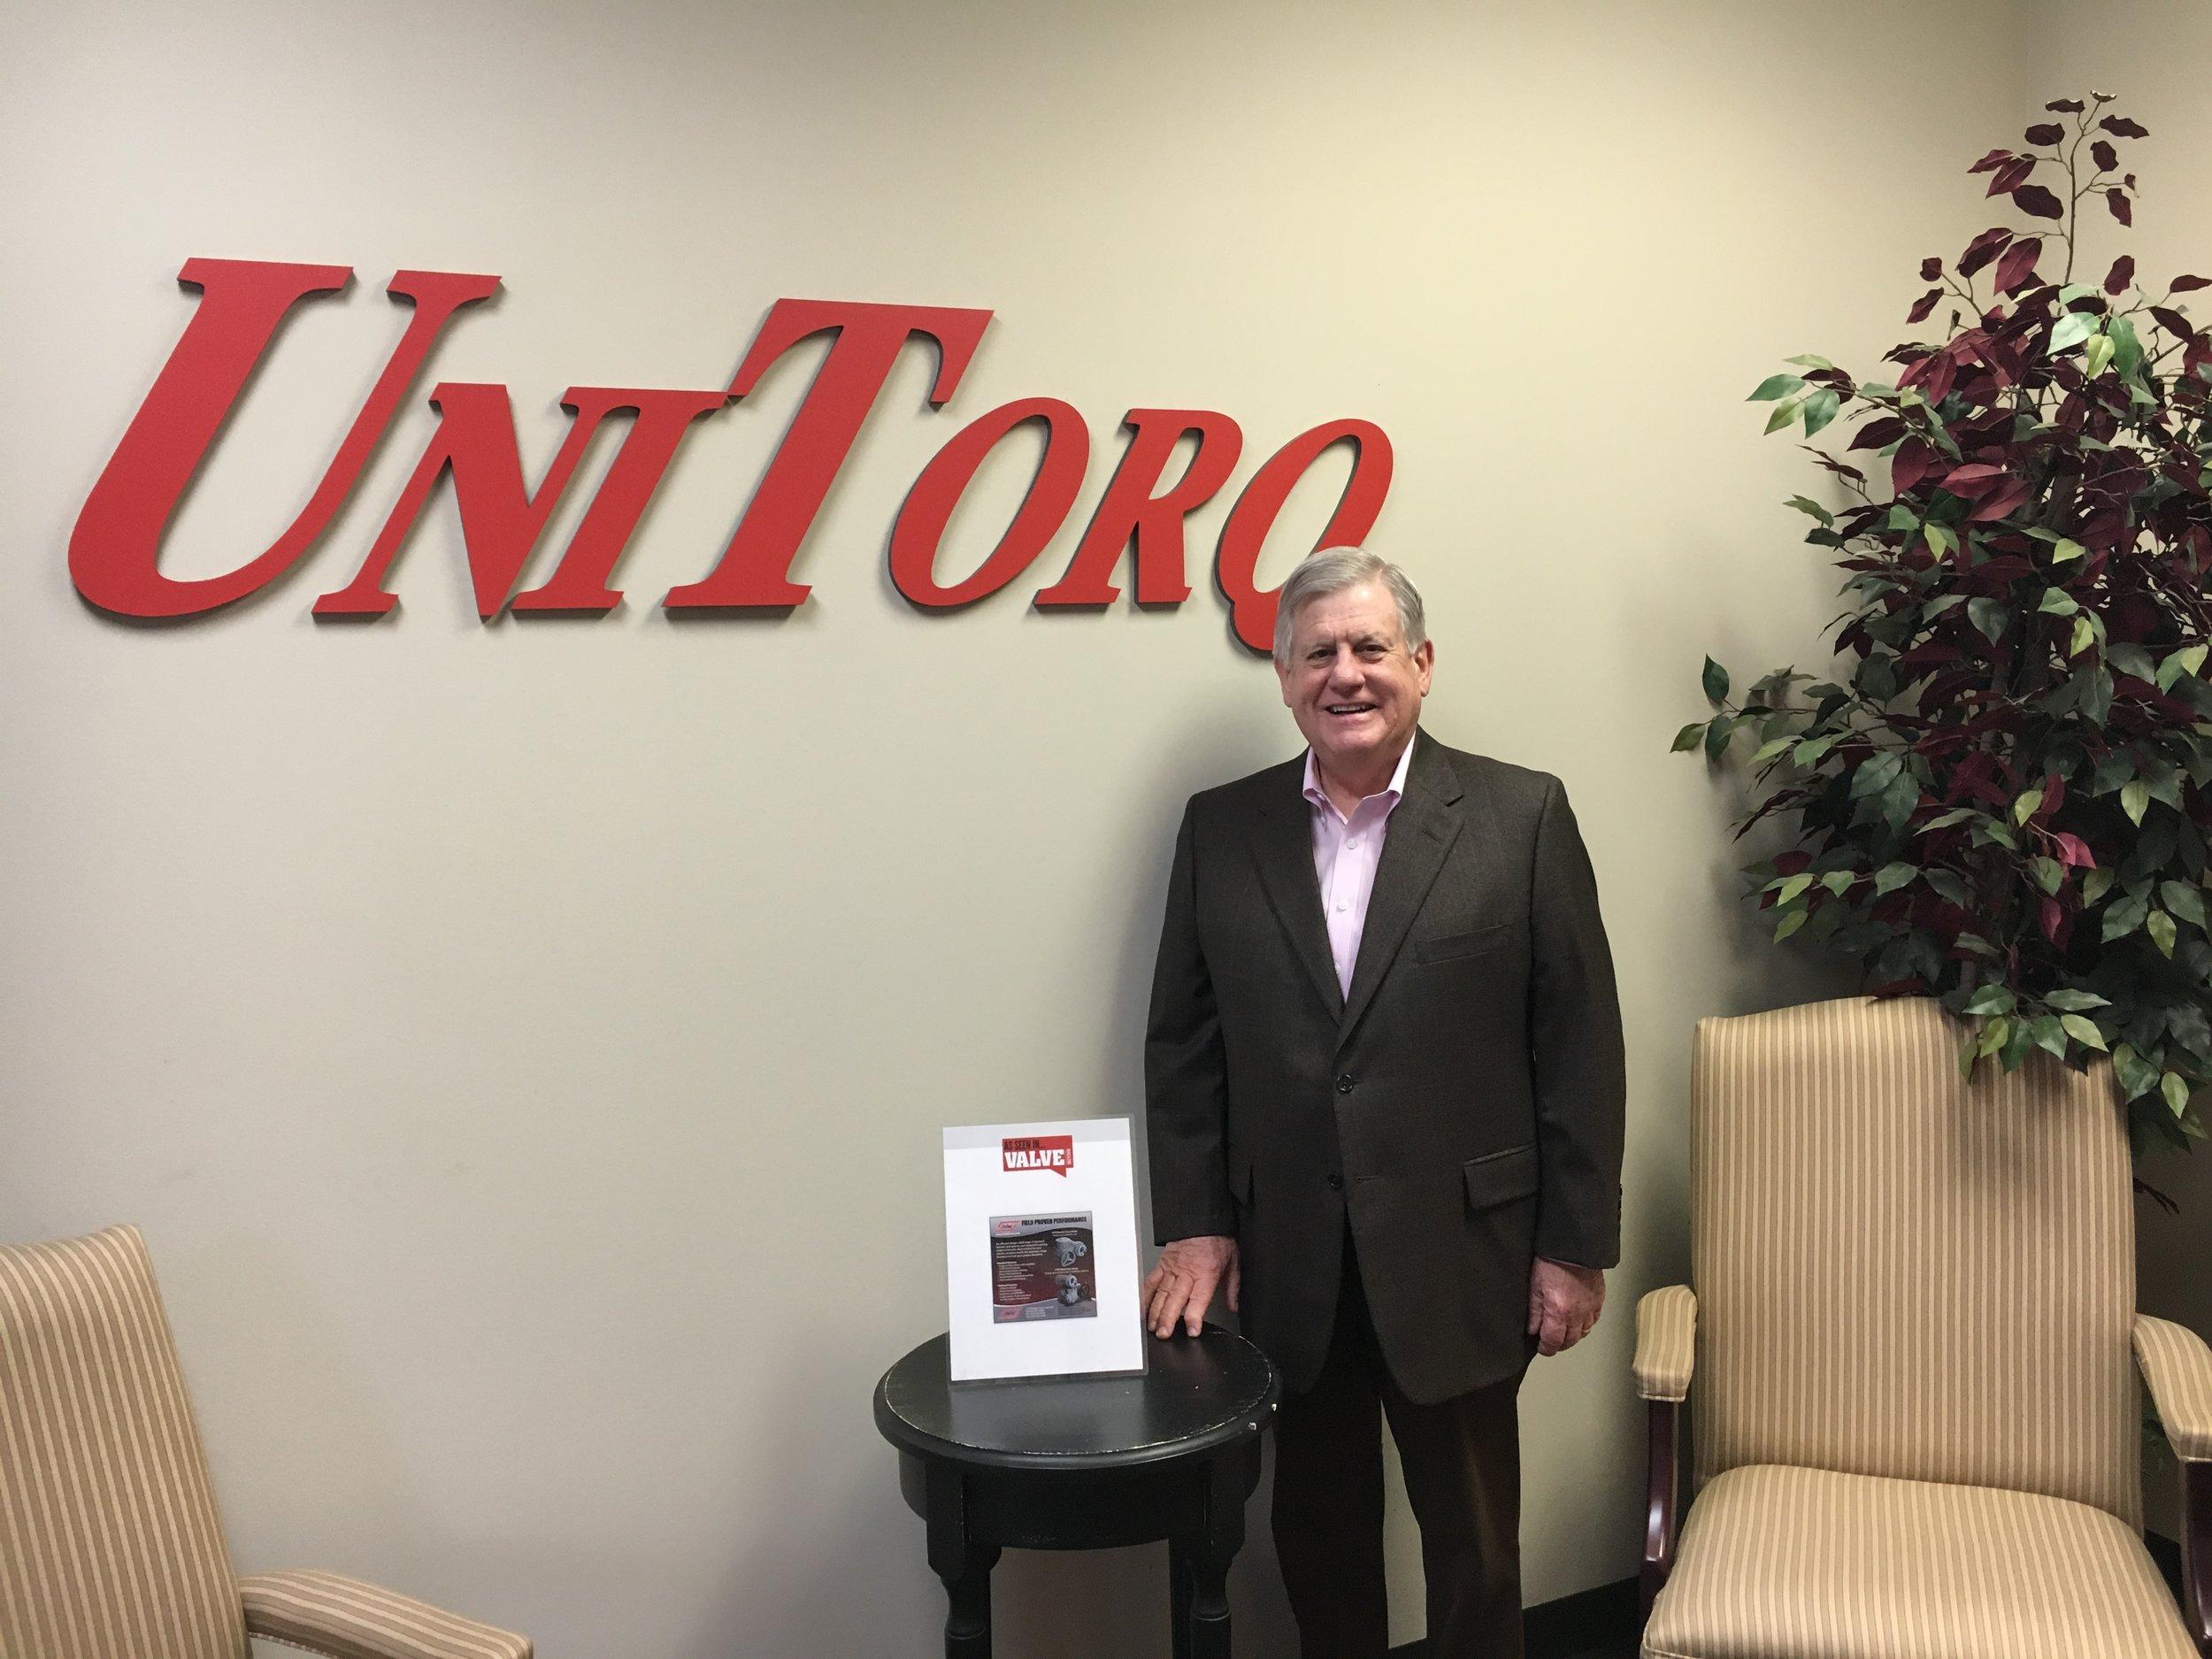 Jack Curtin  CEO,  UniTorq